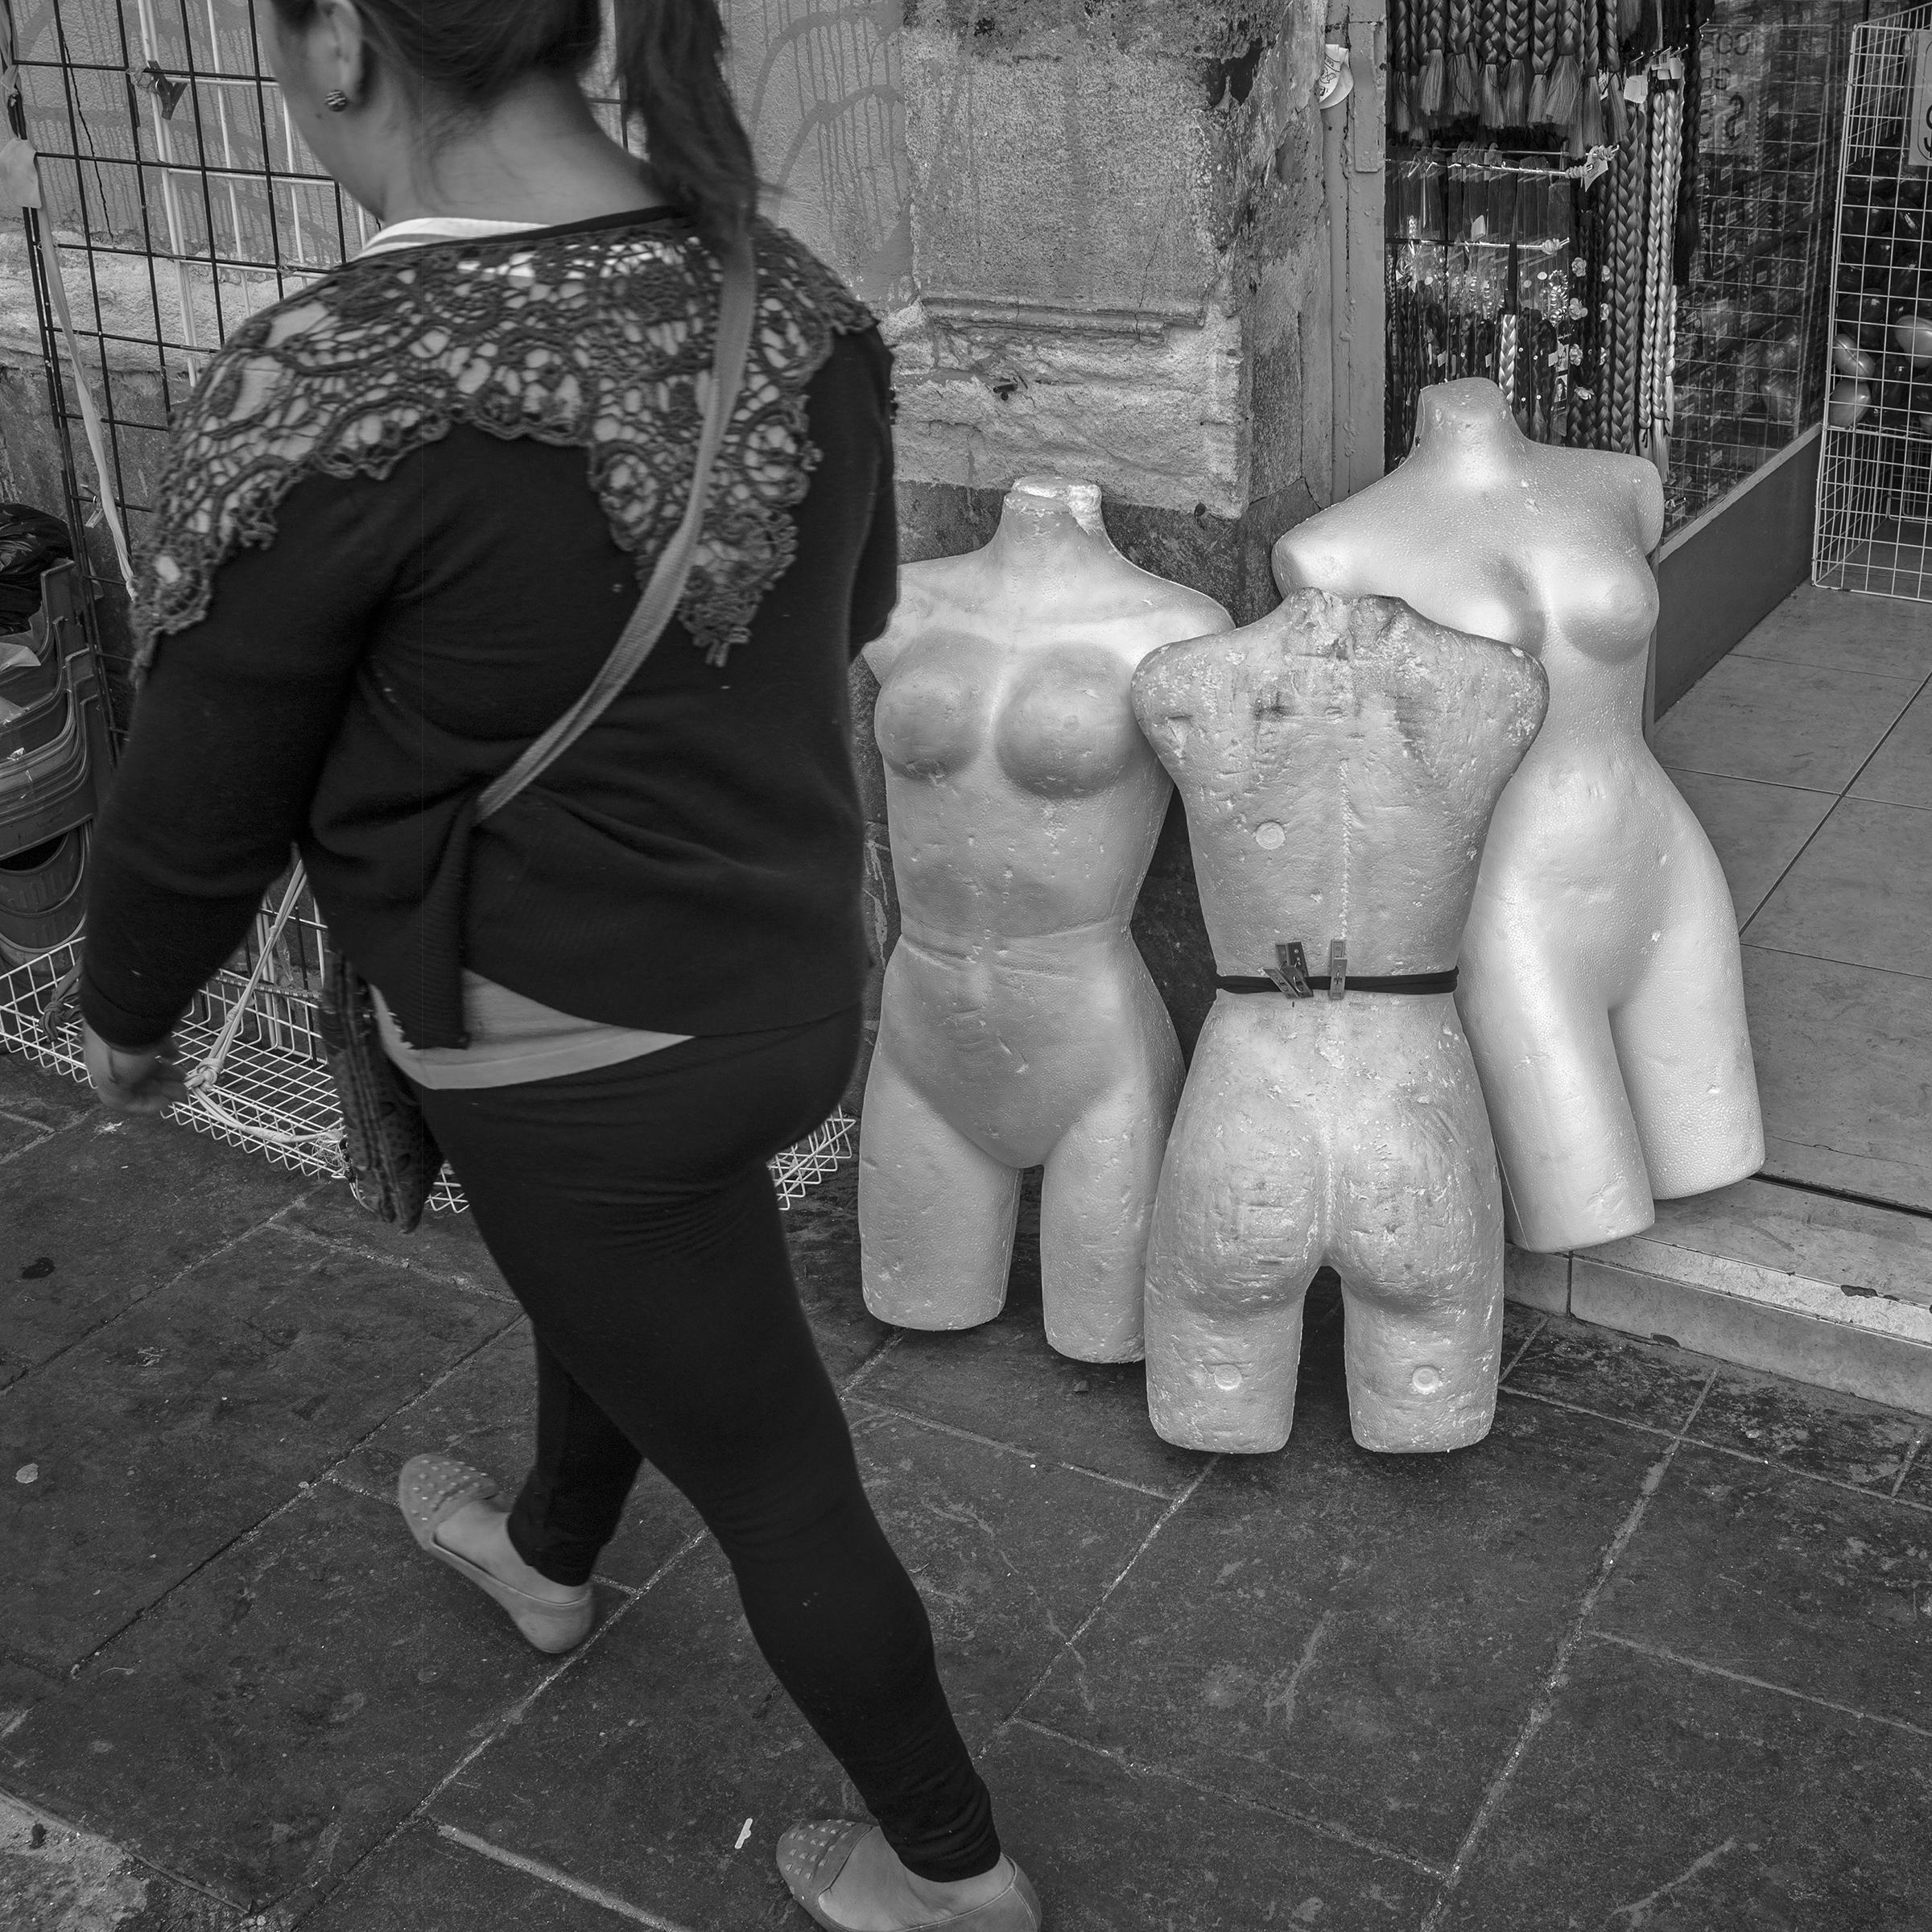 Matthew Kudelka, Mexico City 03, 2015